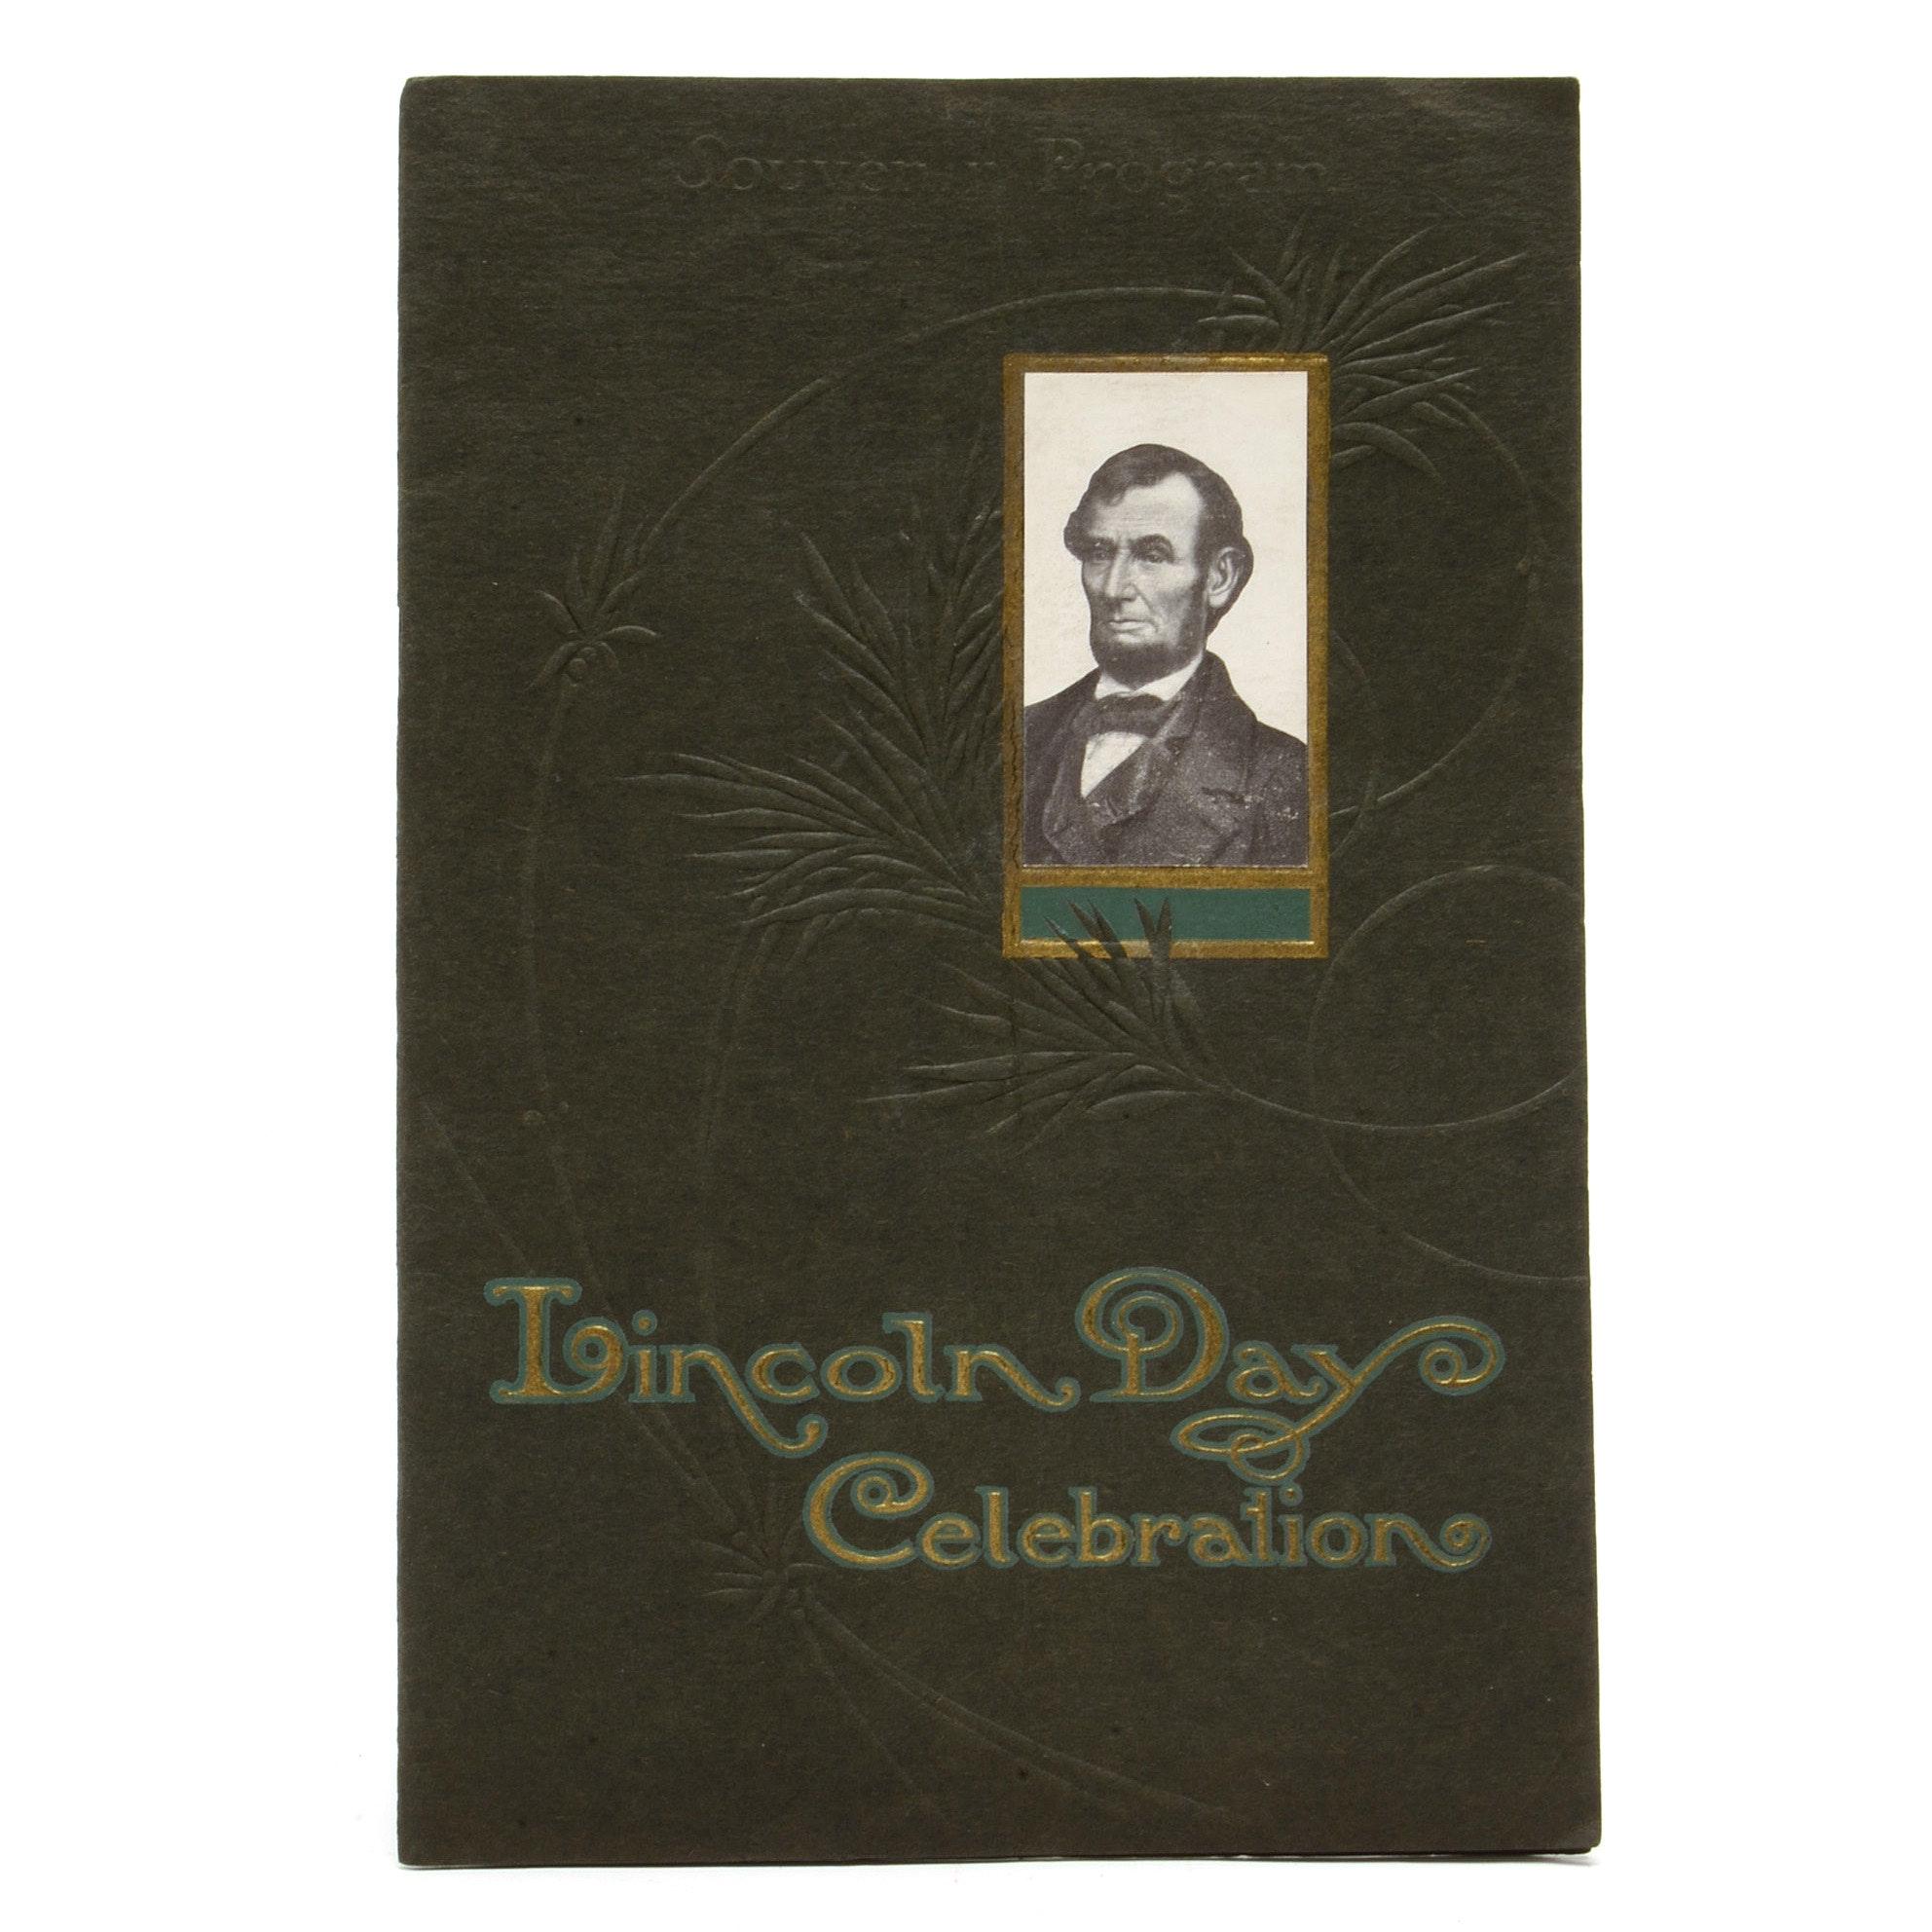 """Lincoln Day Celebration"" Pamphlet, Music Hall, Cincinnati, Ohio"